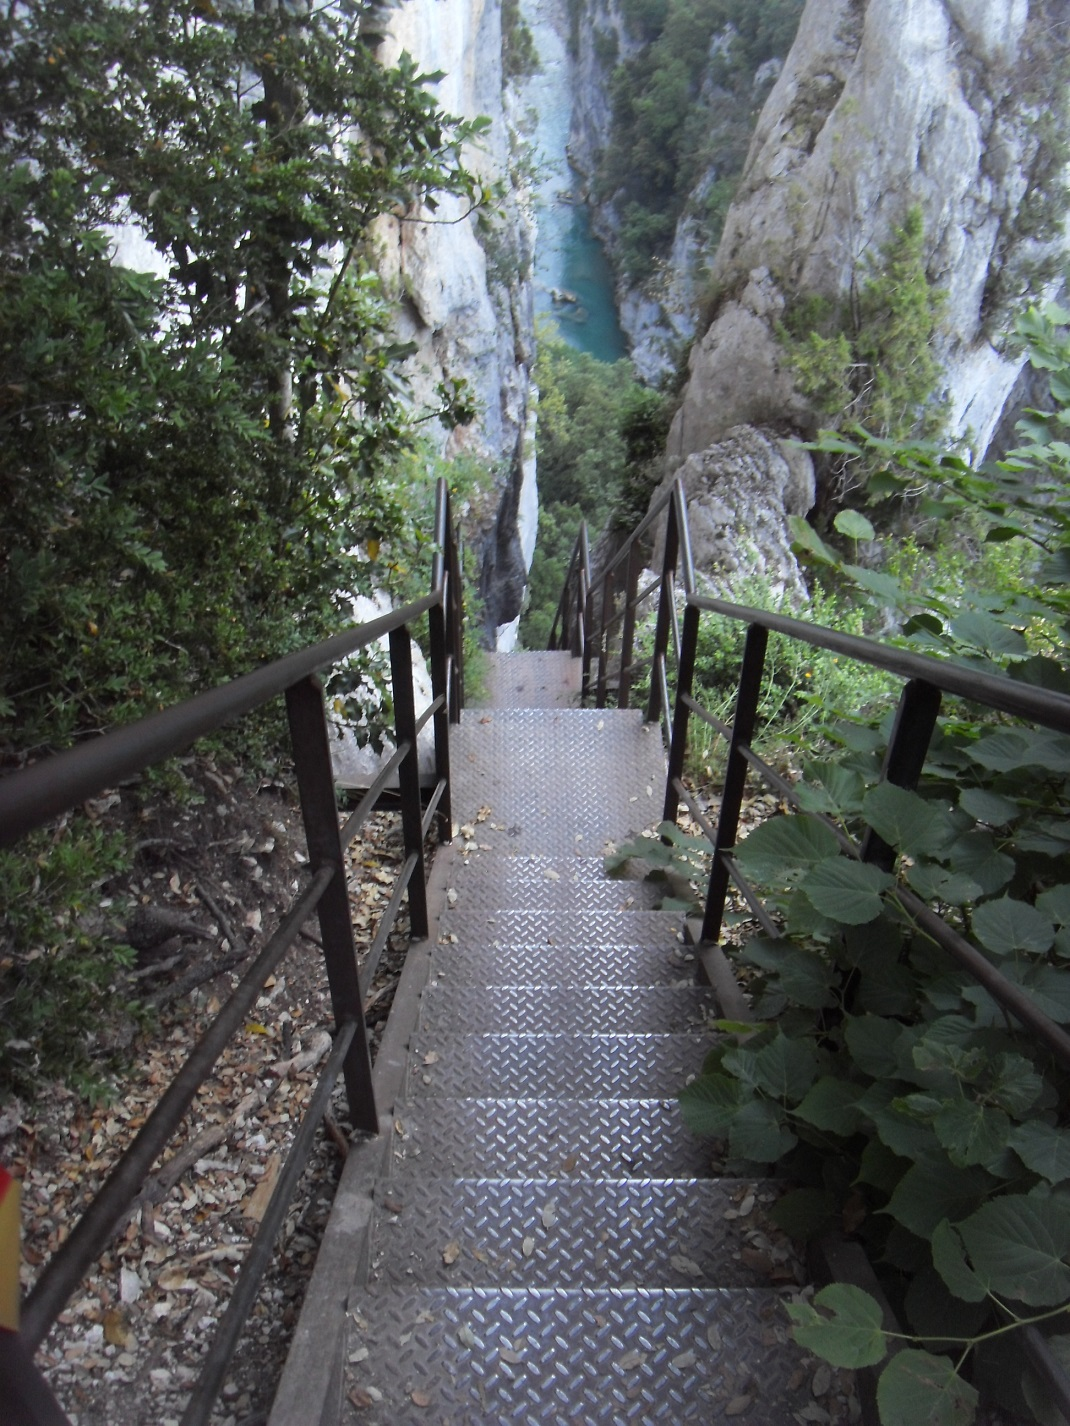 29-Les escaliers de la Brèche Imbert, vertigineux..